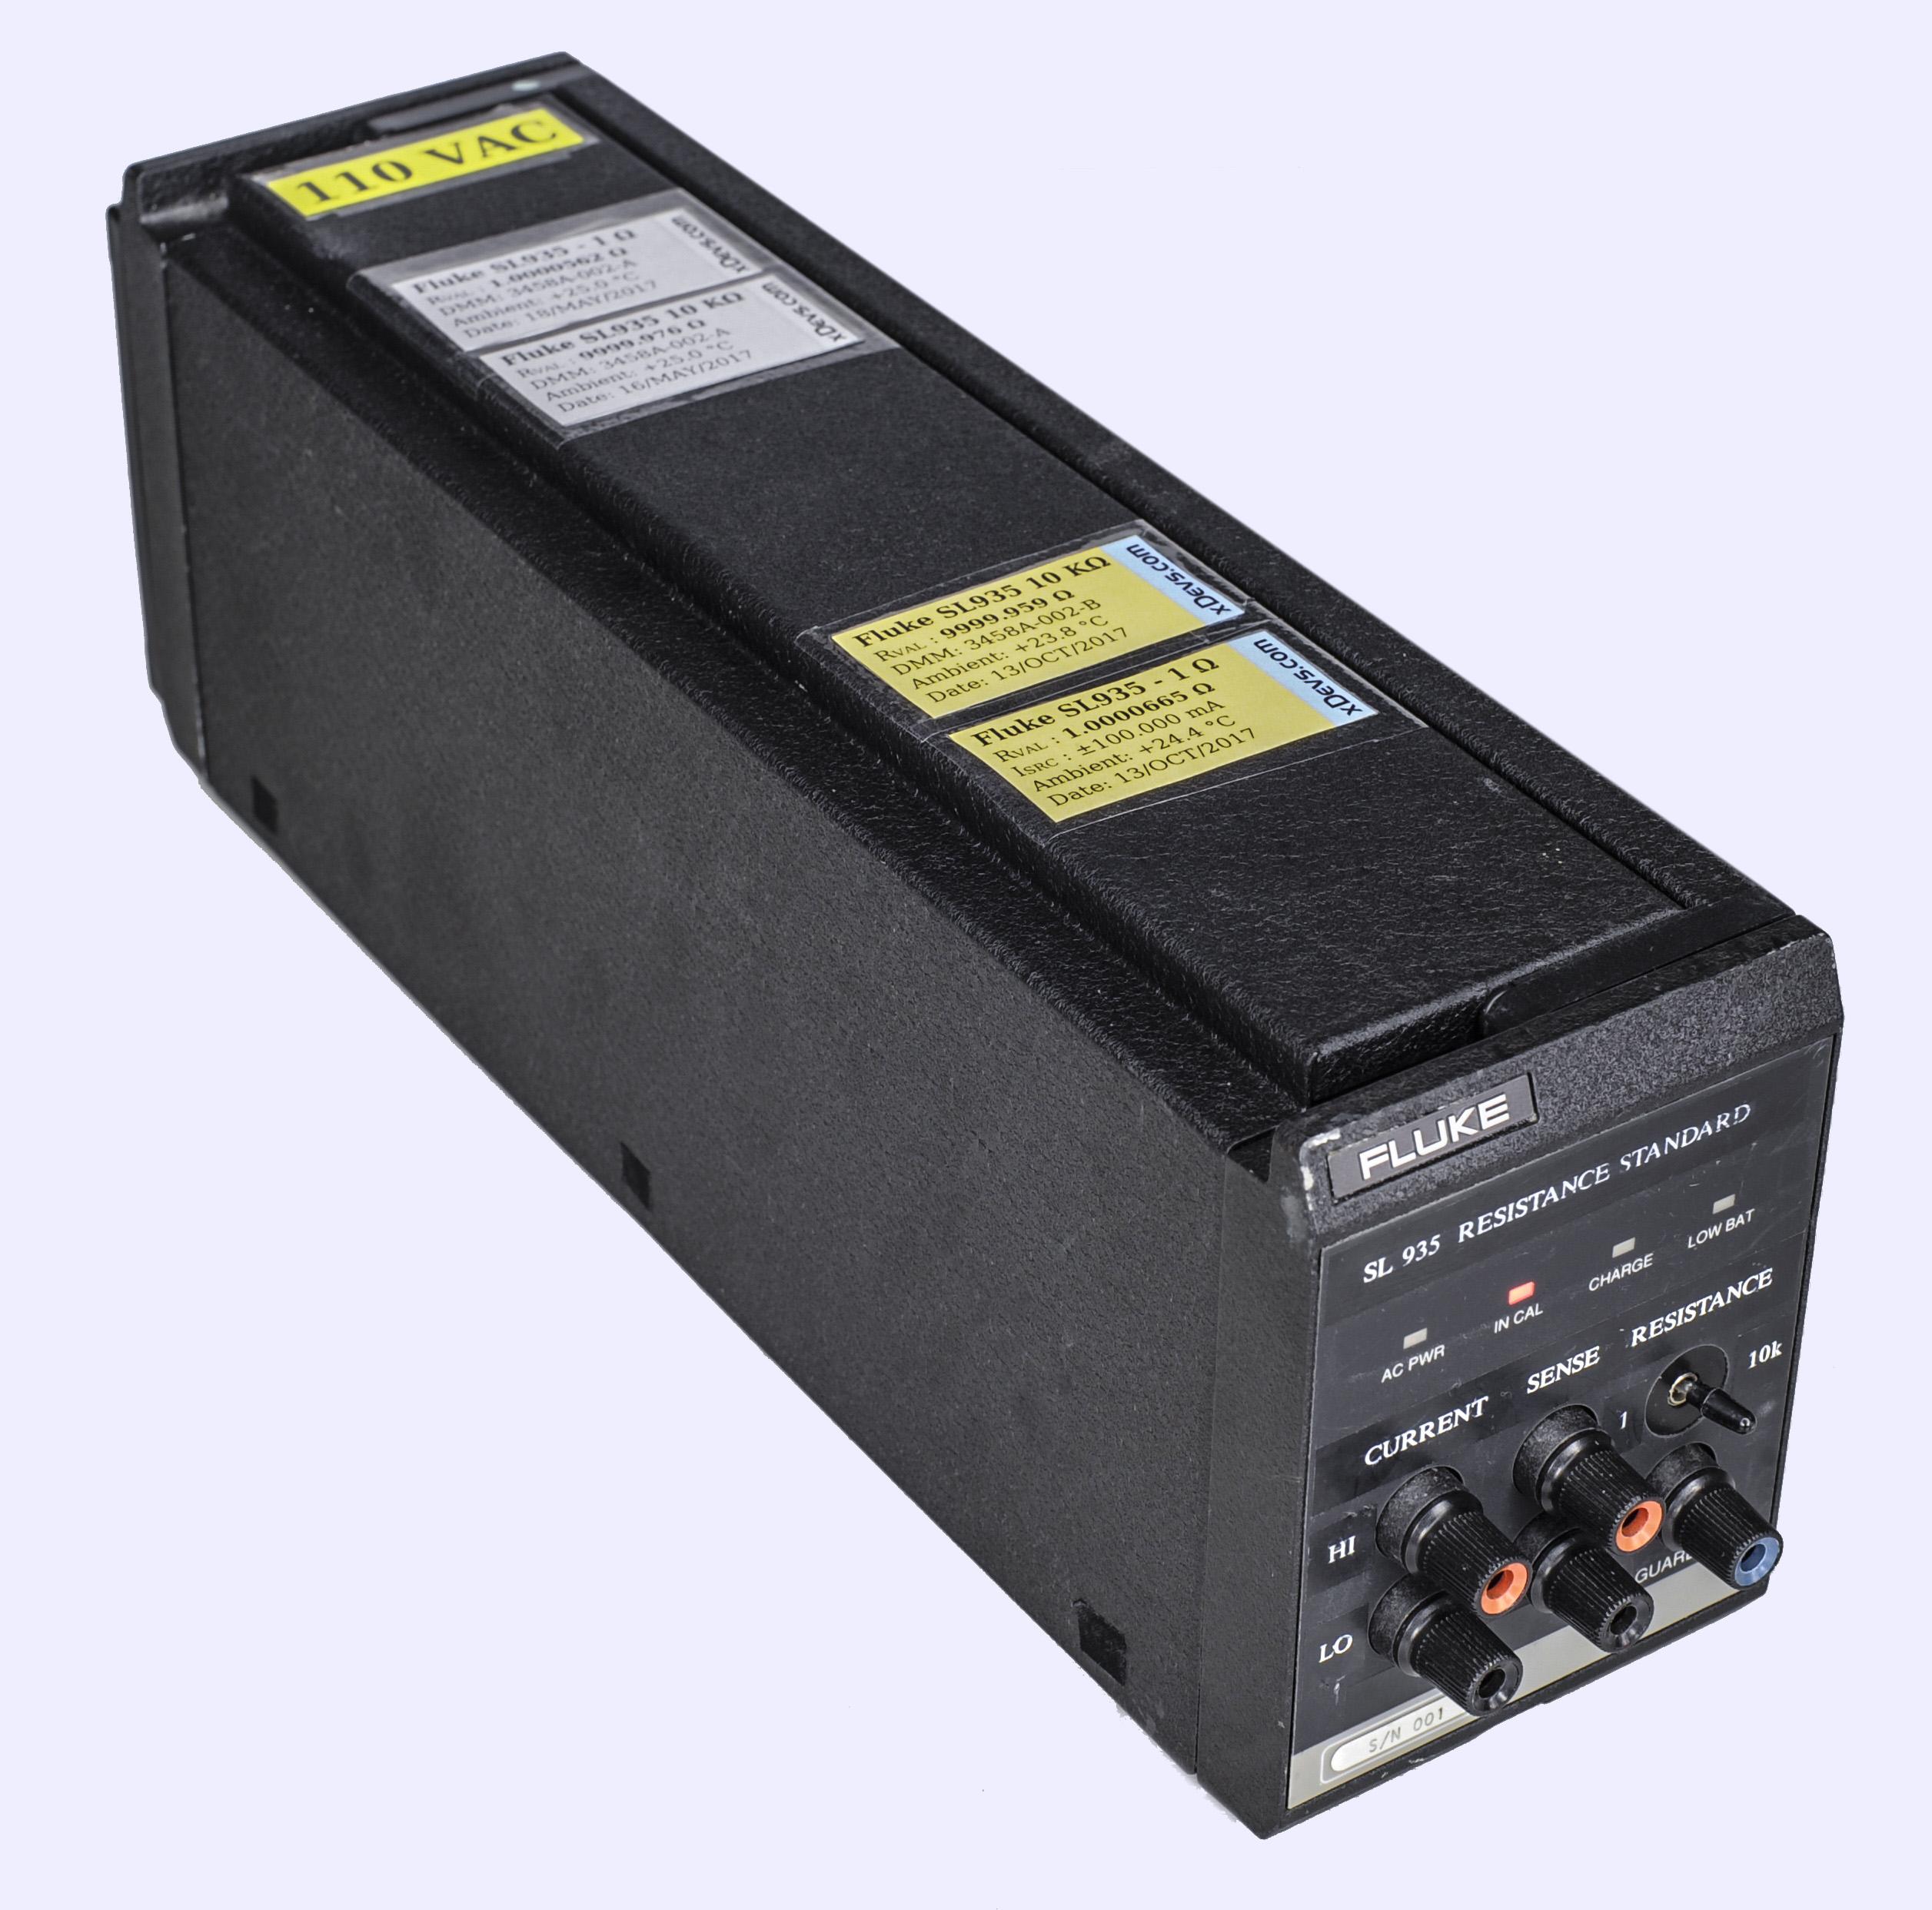 xDevs com   Fluke SL935 heated resistance standard prototype